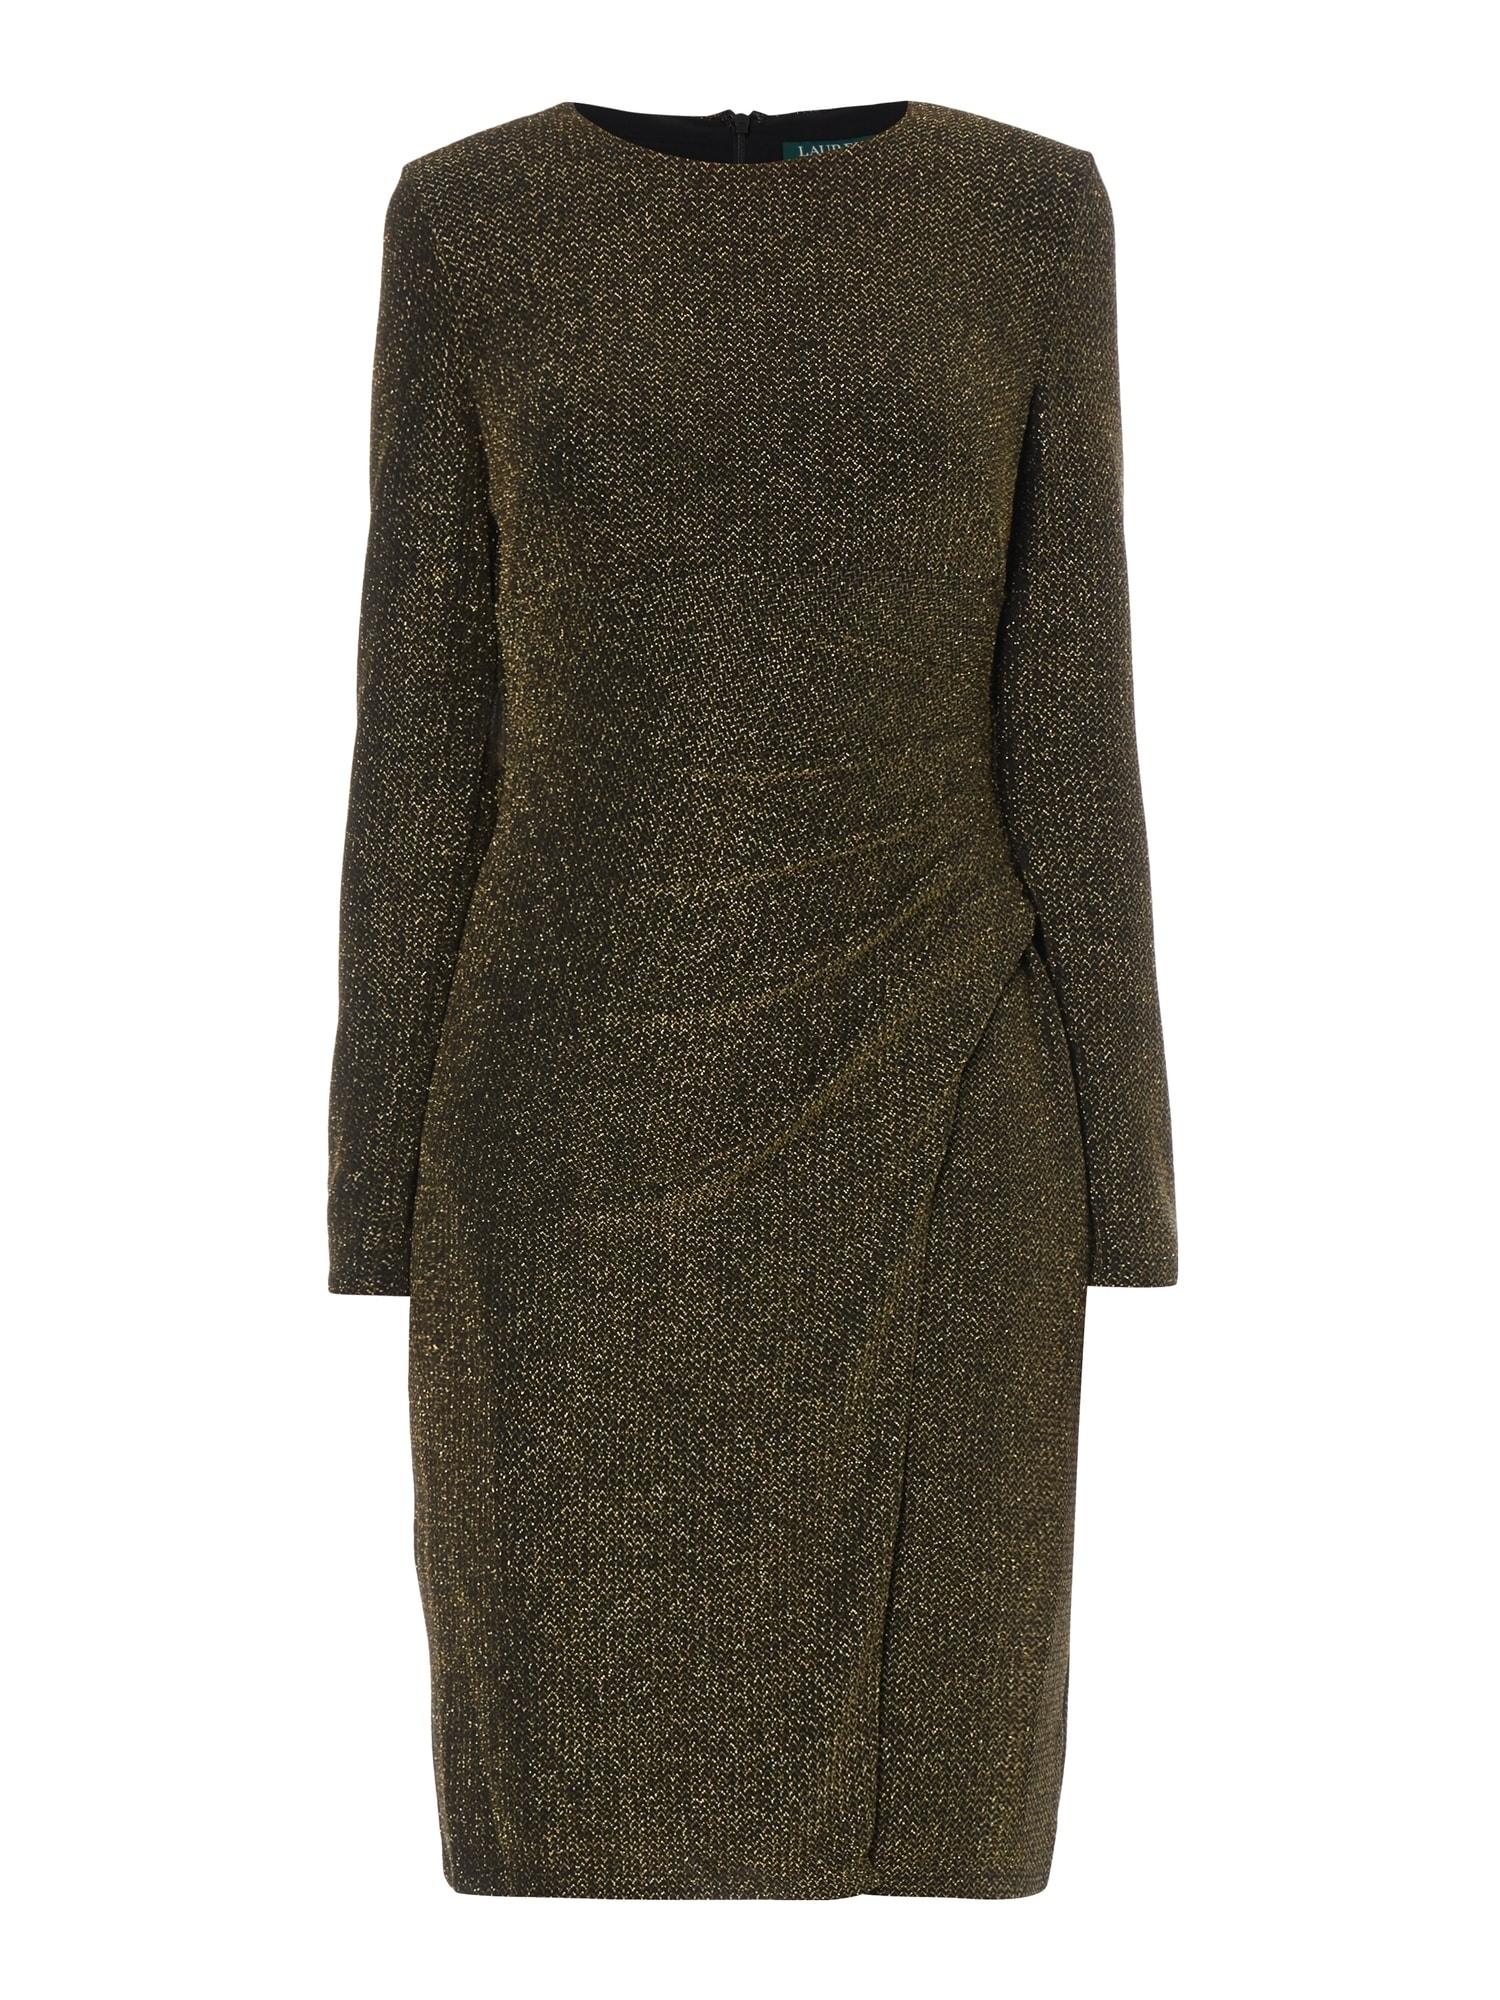 Großartig Kleider Neu Boutique13 Genial Kleider Neu Vertrieb